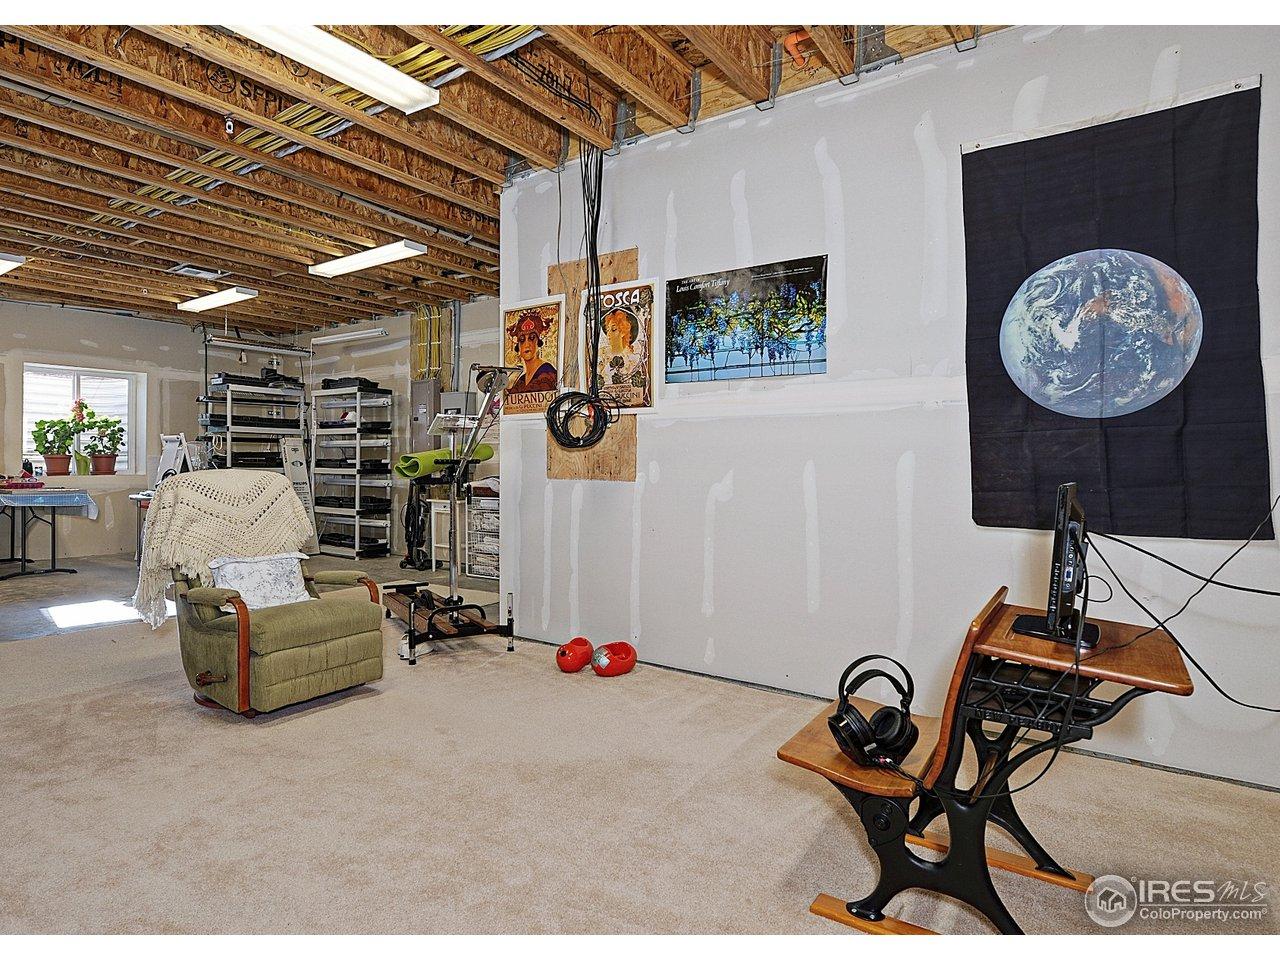 Unfinished basement area